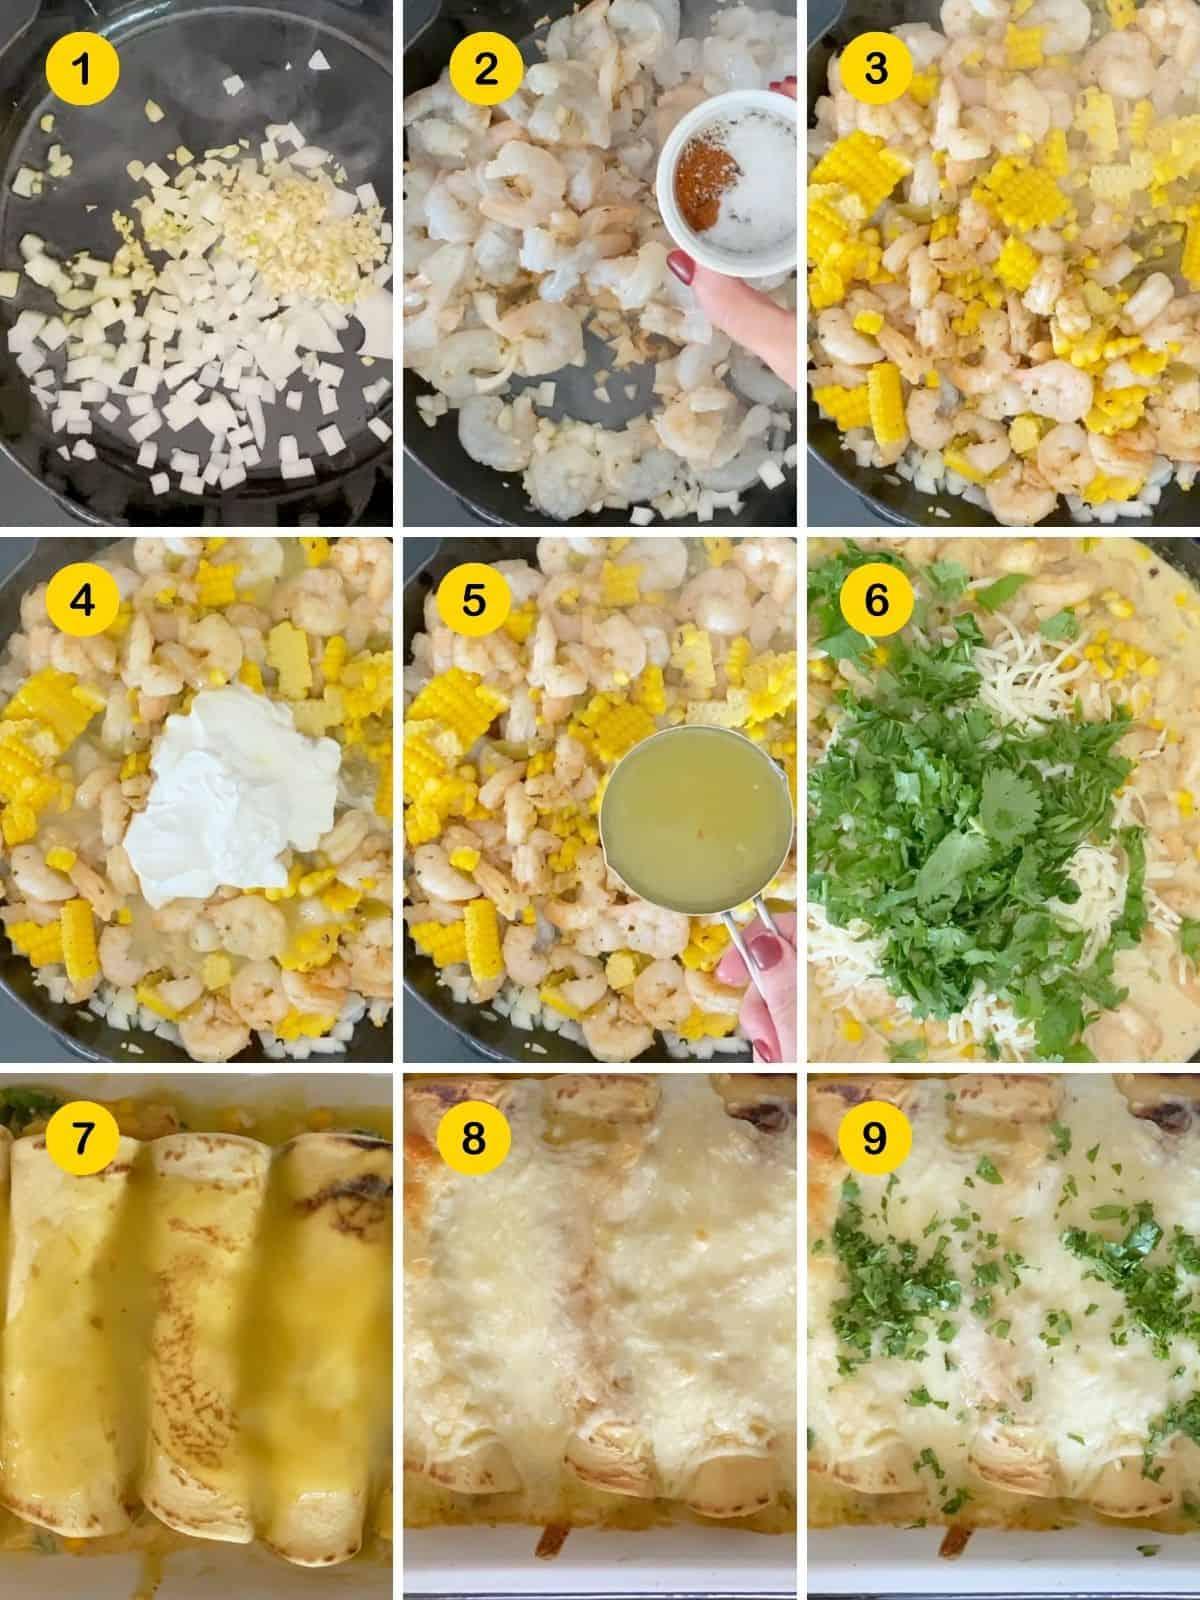 steps for making shrimp enchiladas